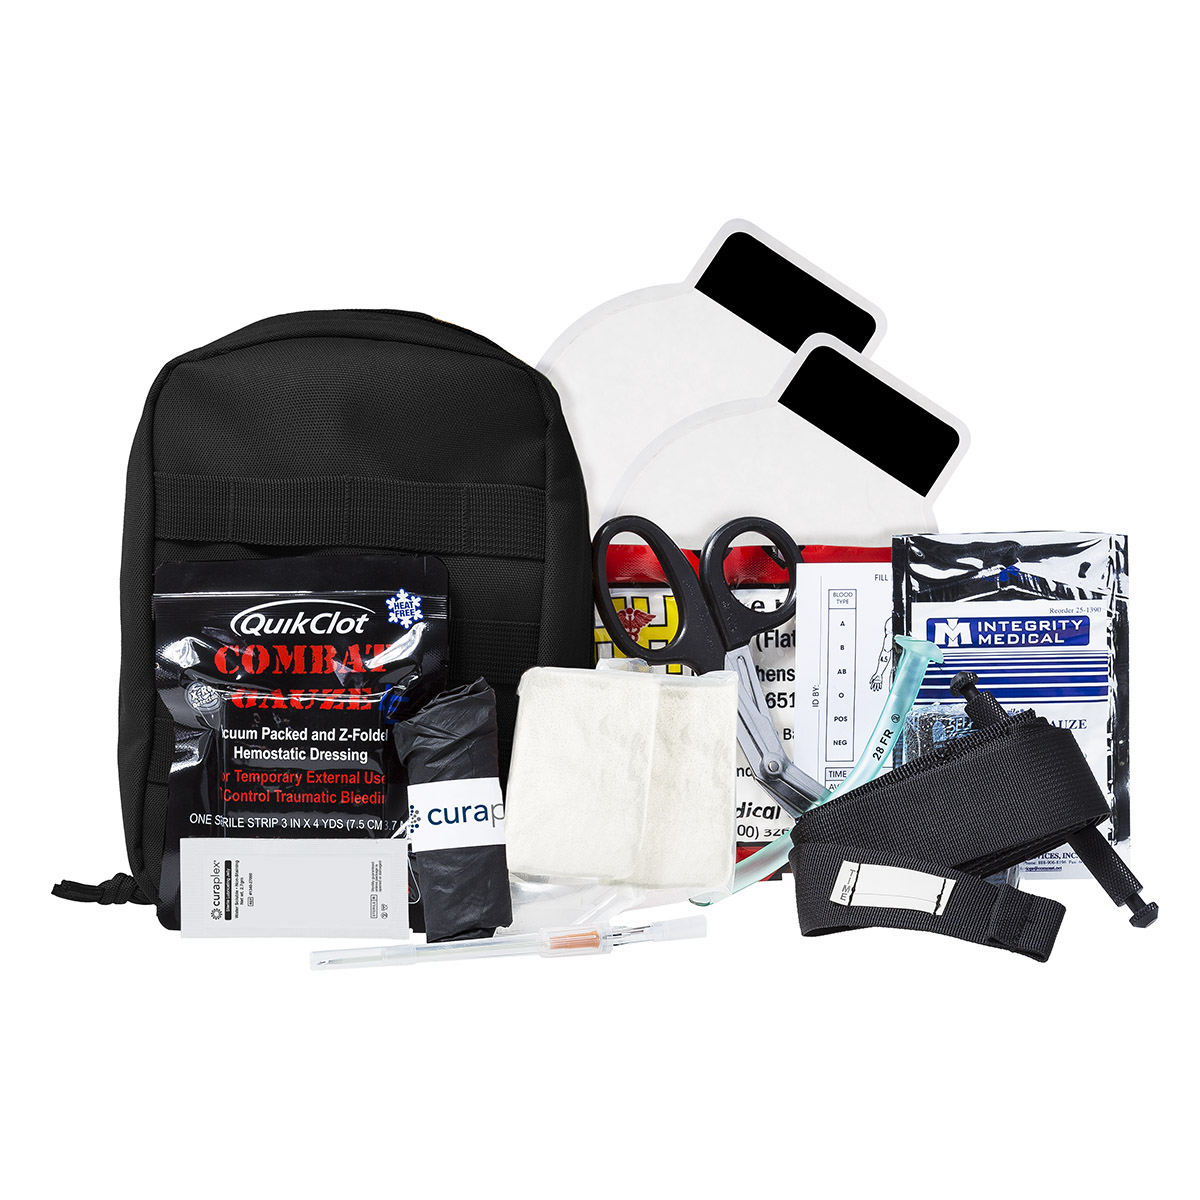 Individual First Aid Kits (IFAKs)